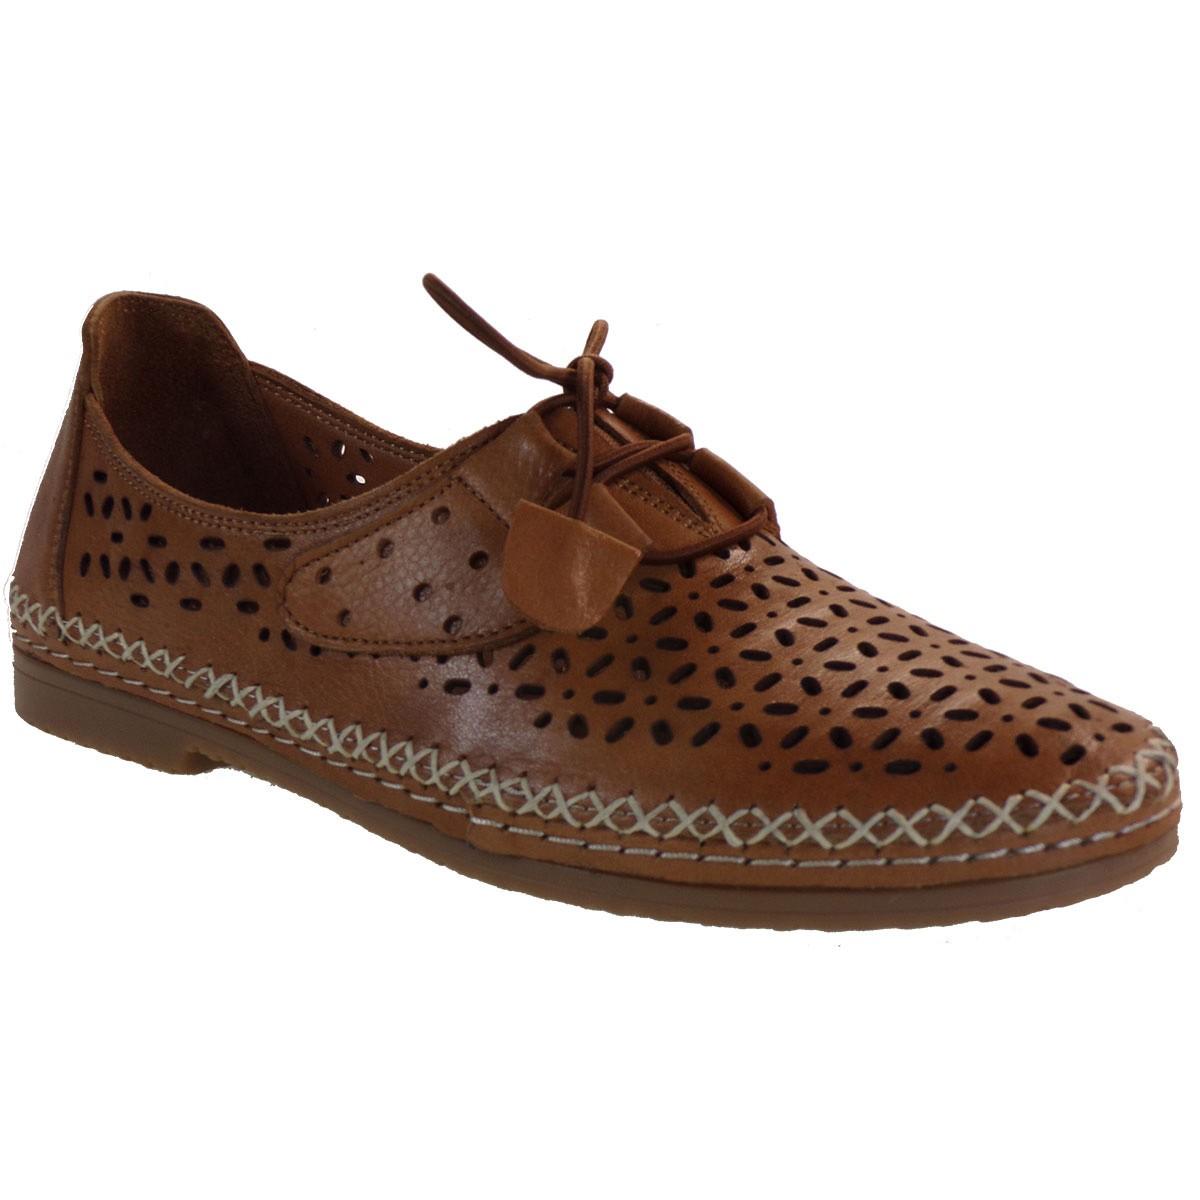 Road Shoes Γυναικεία Παπούτσια Εσπαντρίγιες 17215-207 Ταμπά Δέρμα